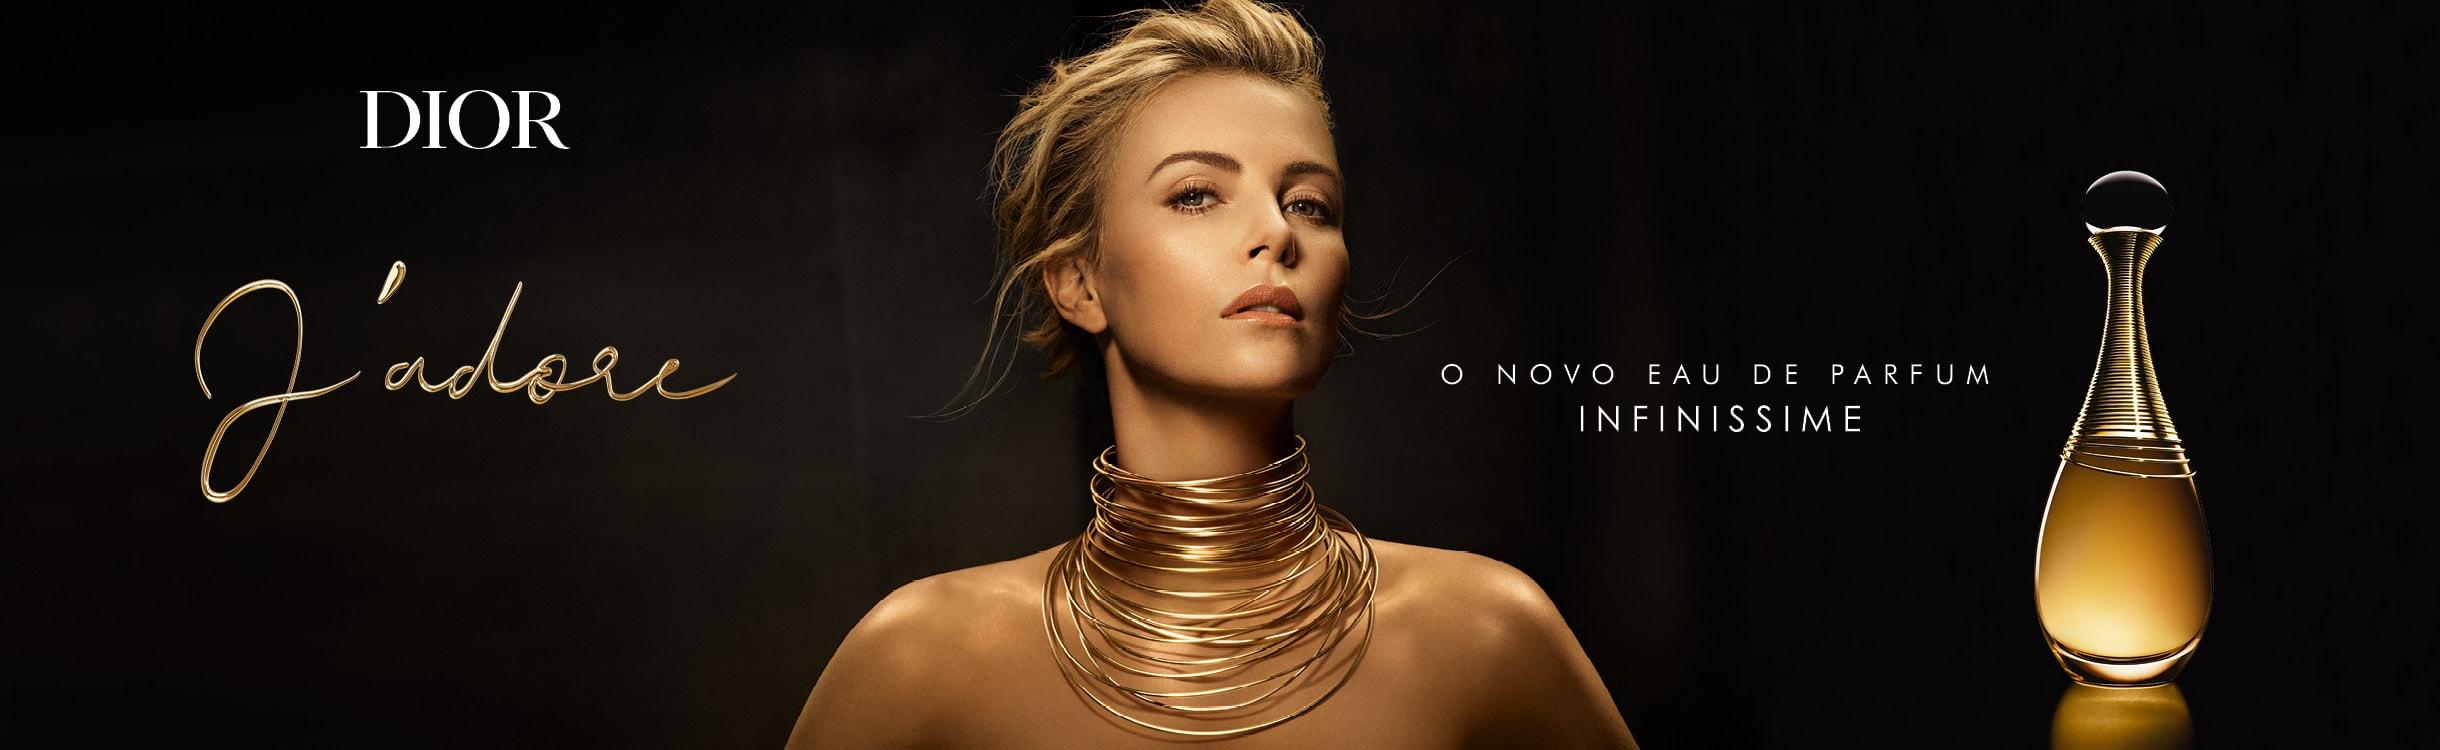 Perfumes Femininos Dior